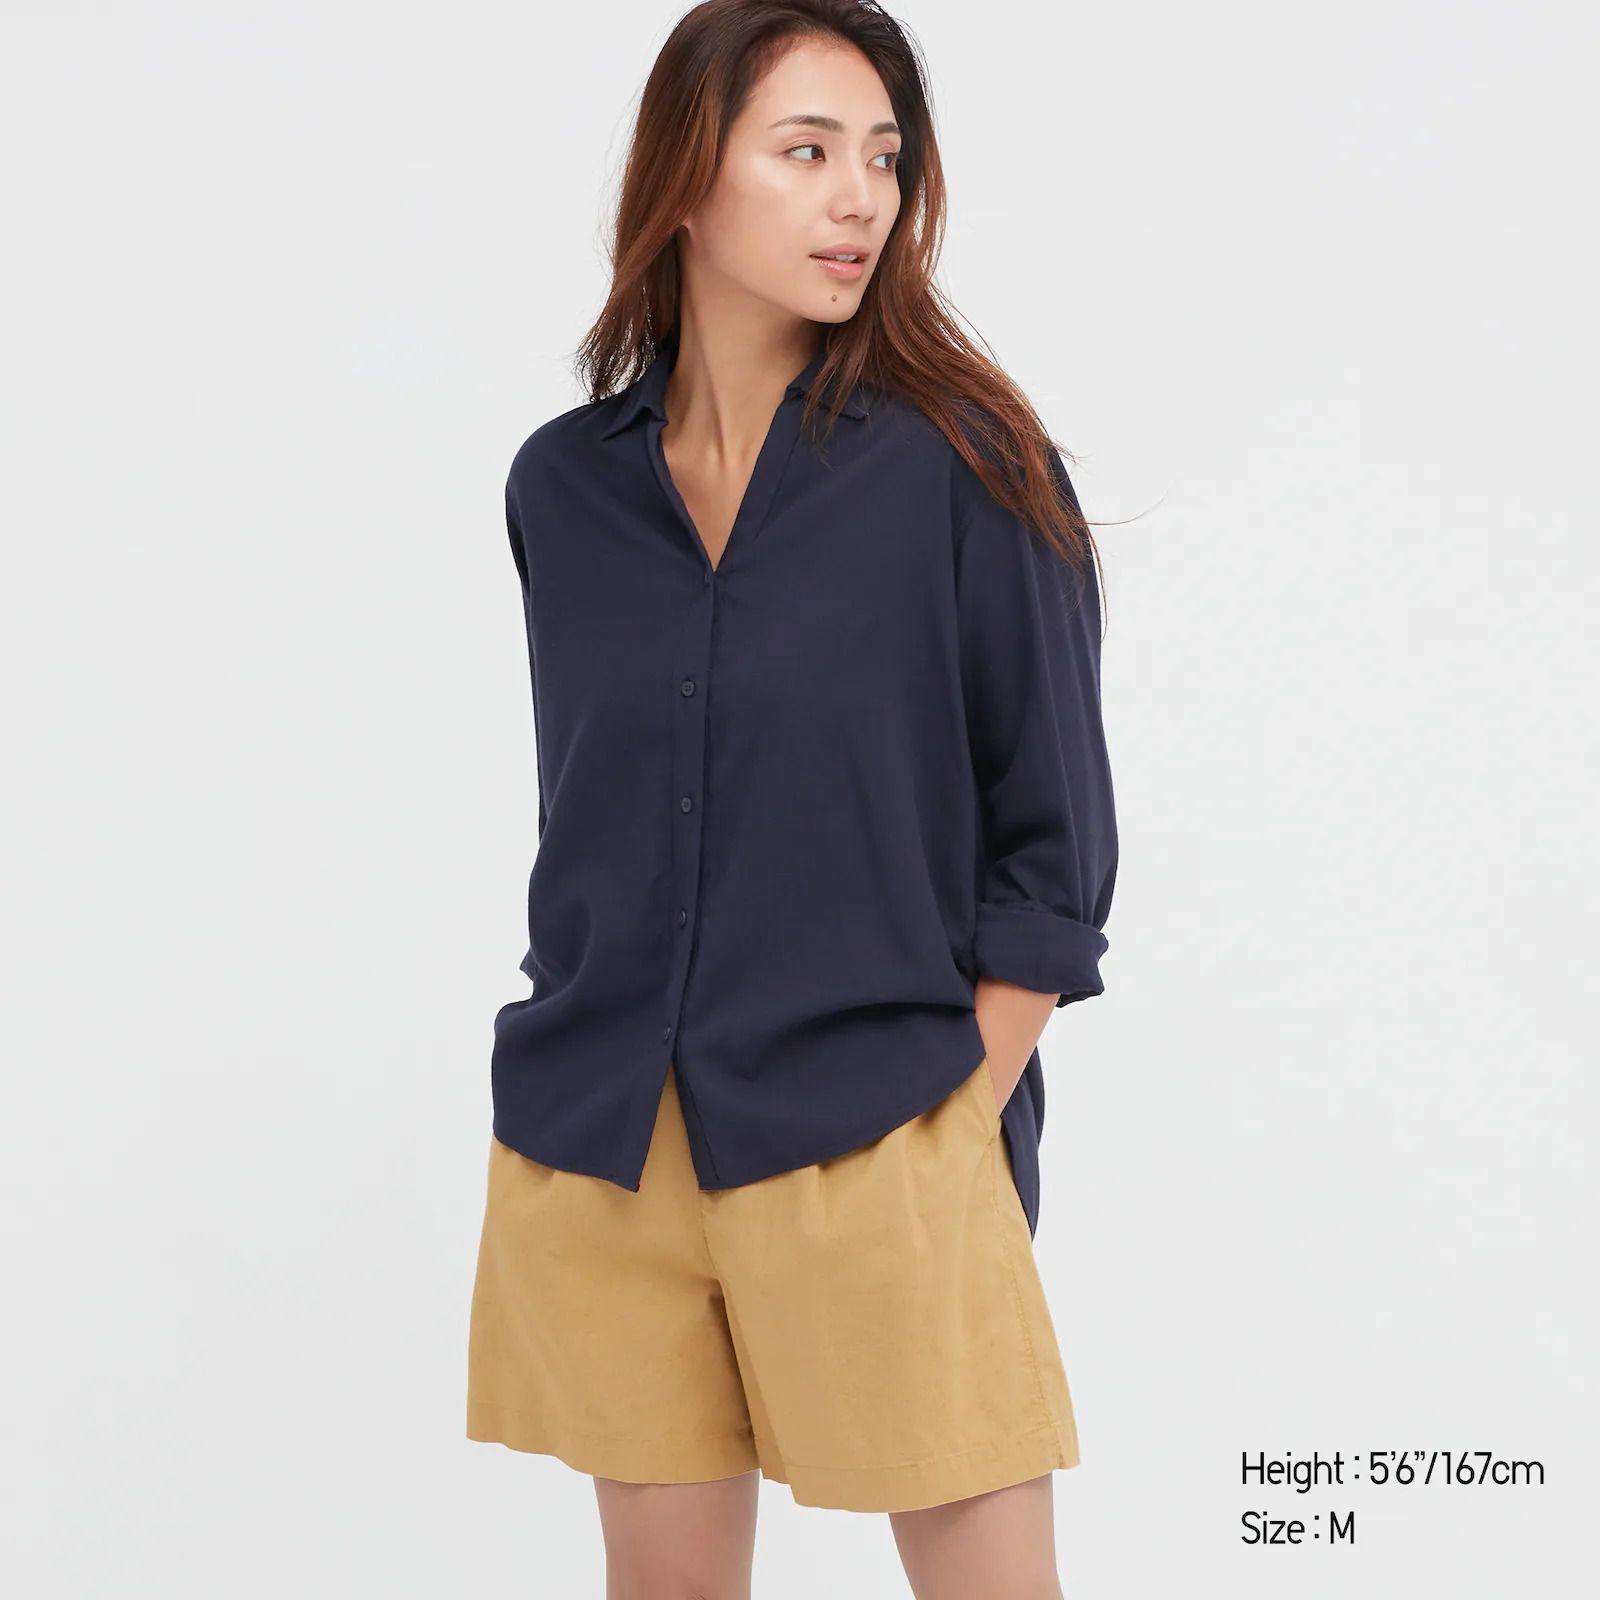 #PopbelaOOTD: Rekomendasi Baju Modis Warna Navy di Bawah 500 Ribu